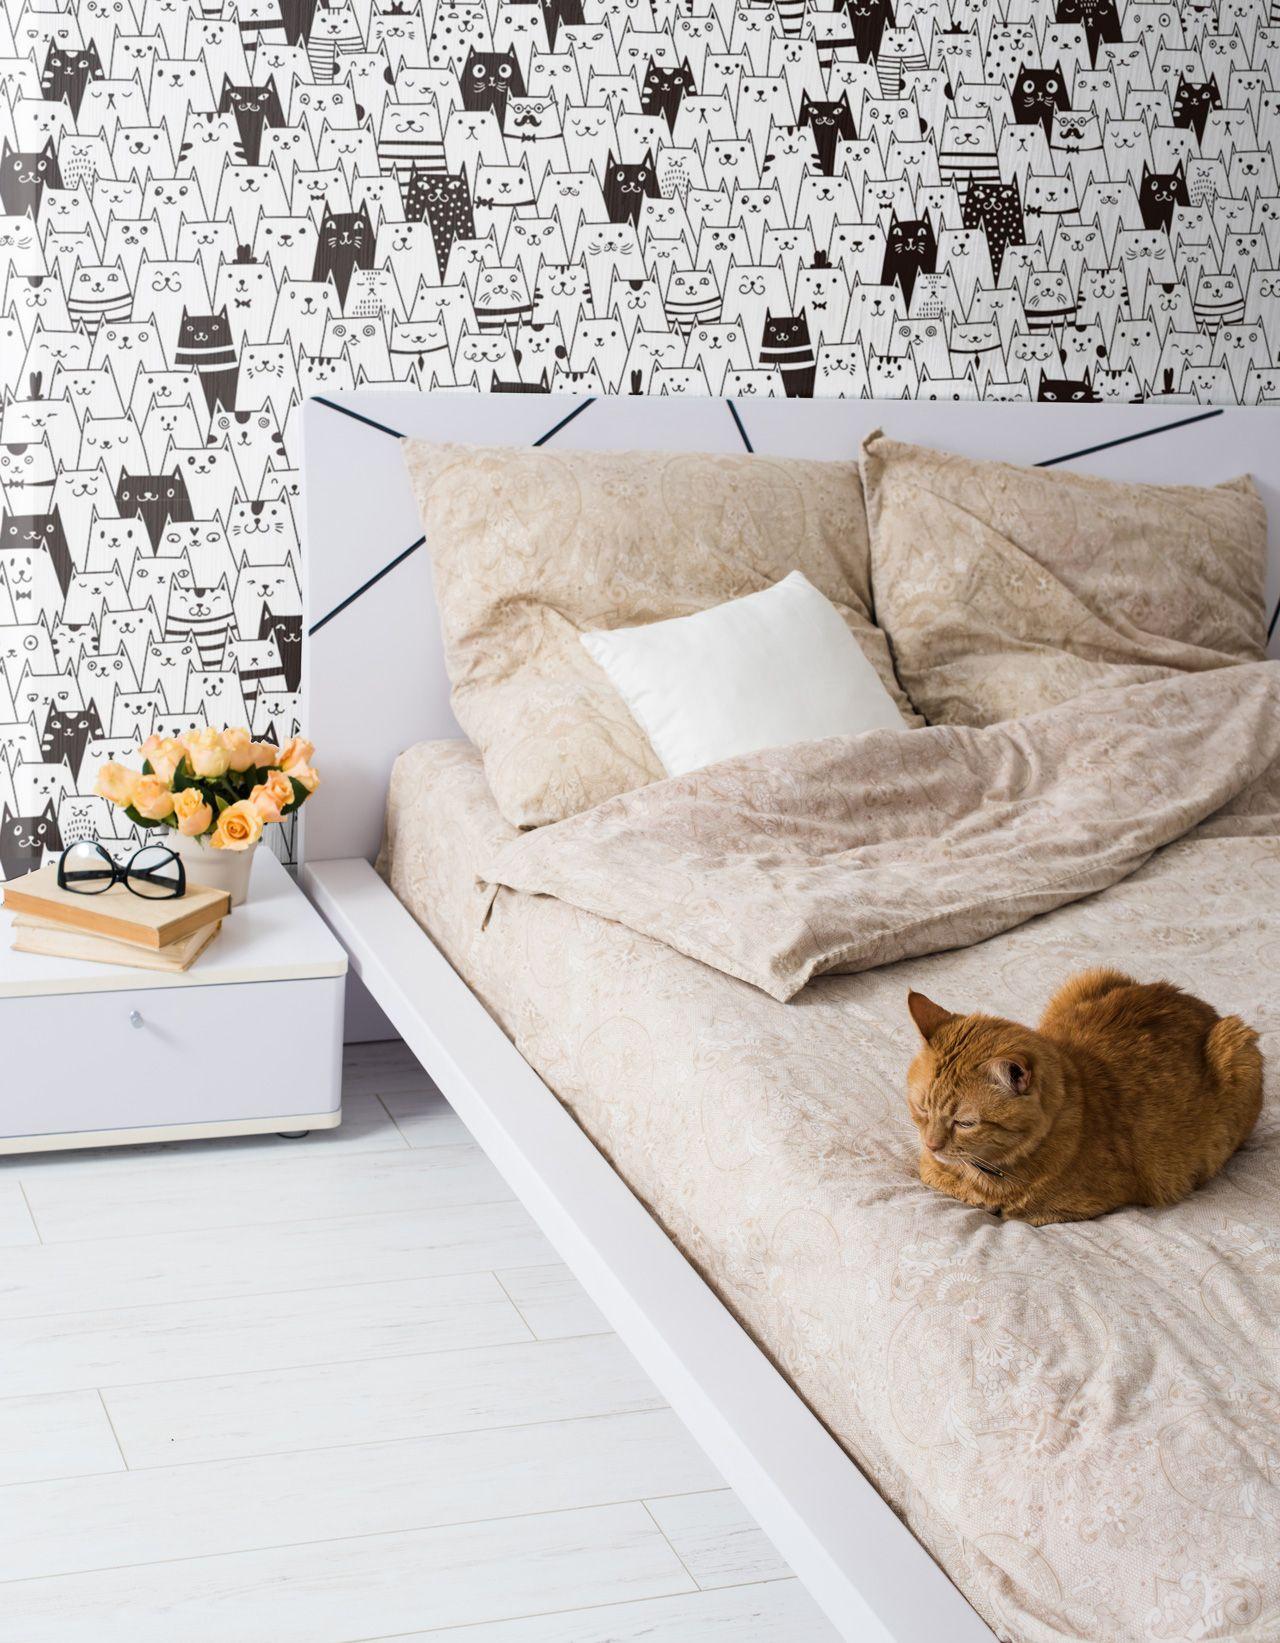 Black And White Geometric Animal Fabric Removable Wallpaper 6188 Removable Wallpaper Removable Wallpaper Bedroom Geometric Animals